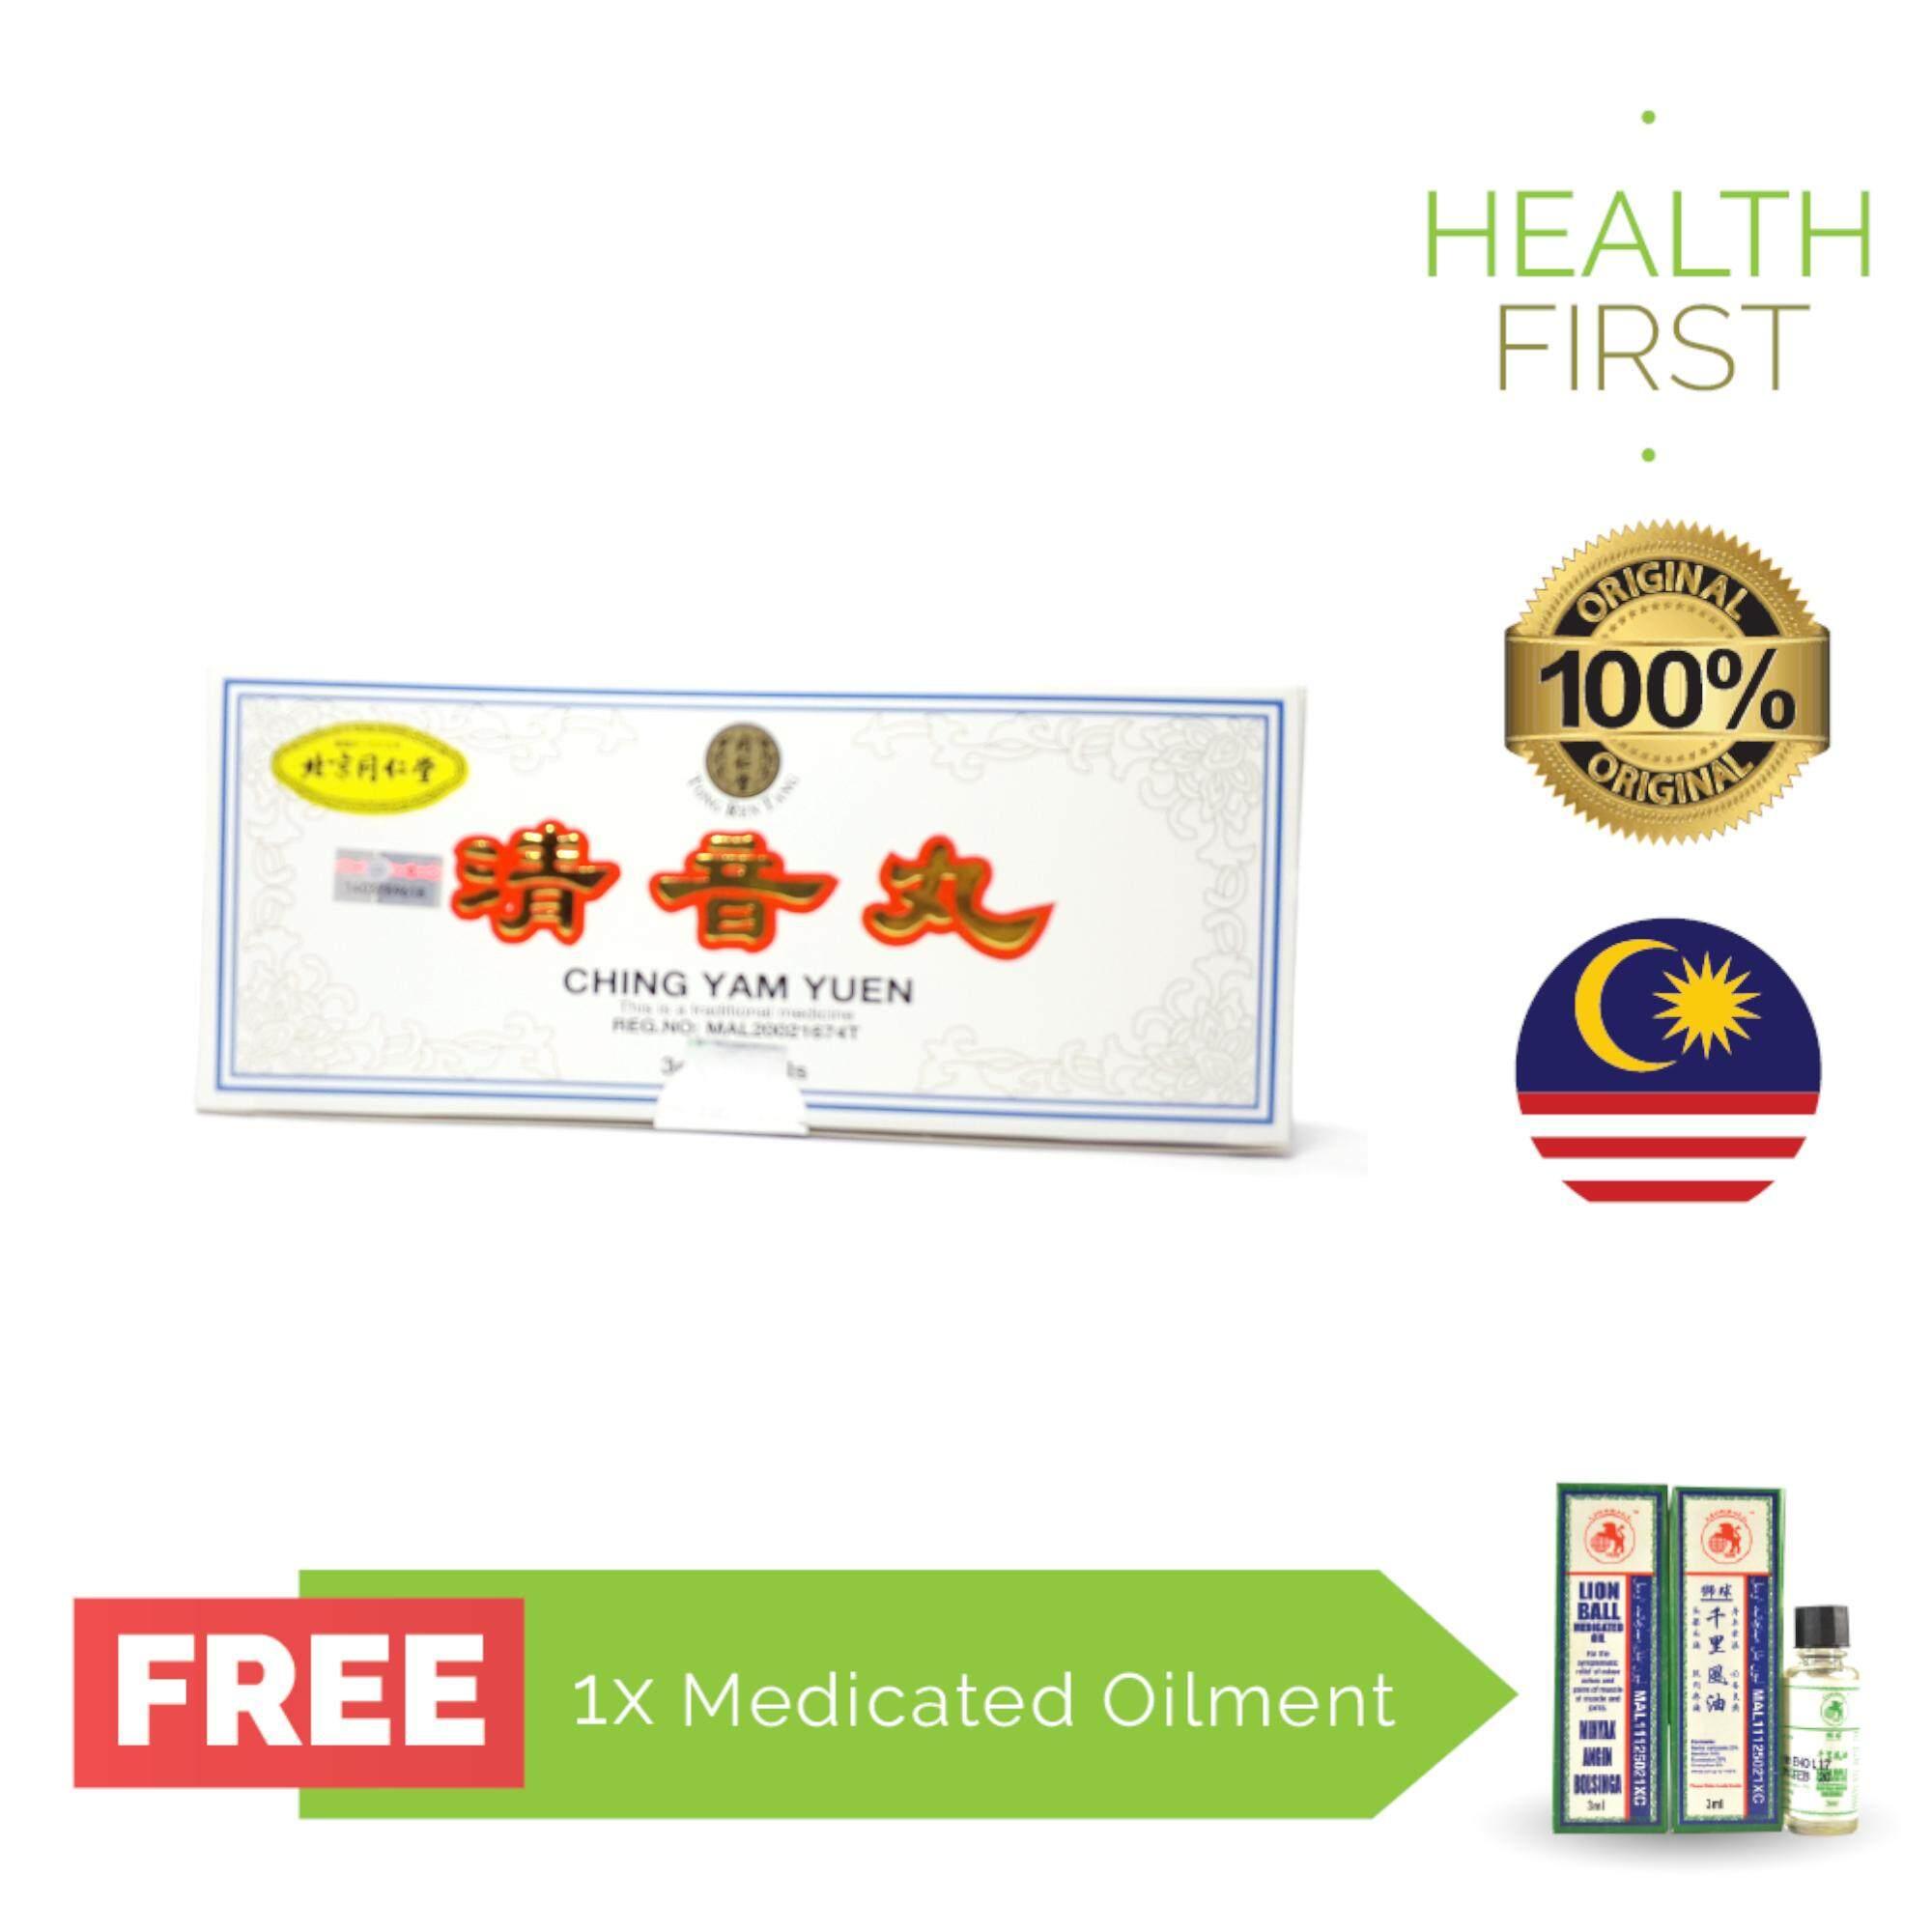 Beijing Tong Ren Tang Buy At Best Price In Niu Huang Wan Ching Yam Yuen 10strip Free 1 Unit Of Lb Medicated Oilment